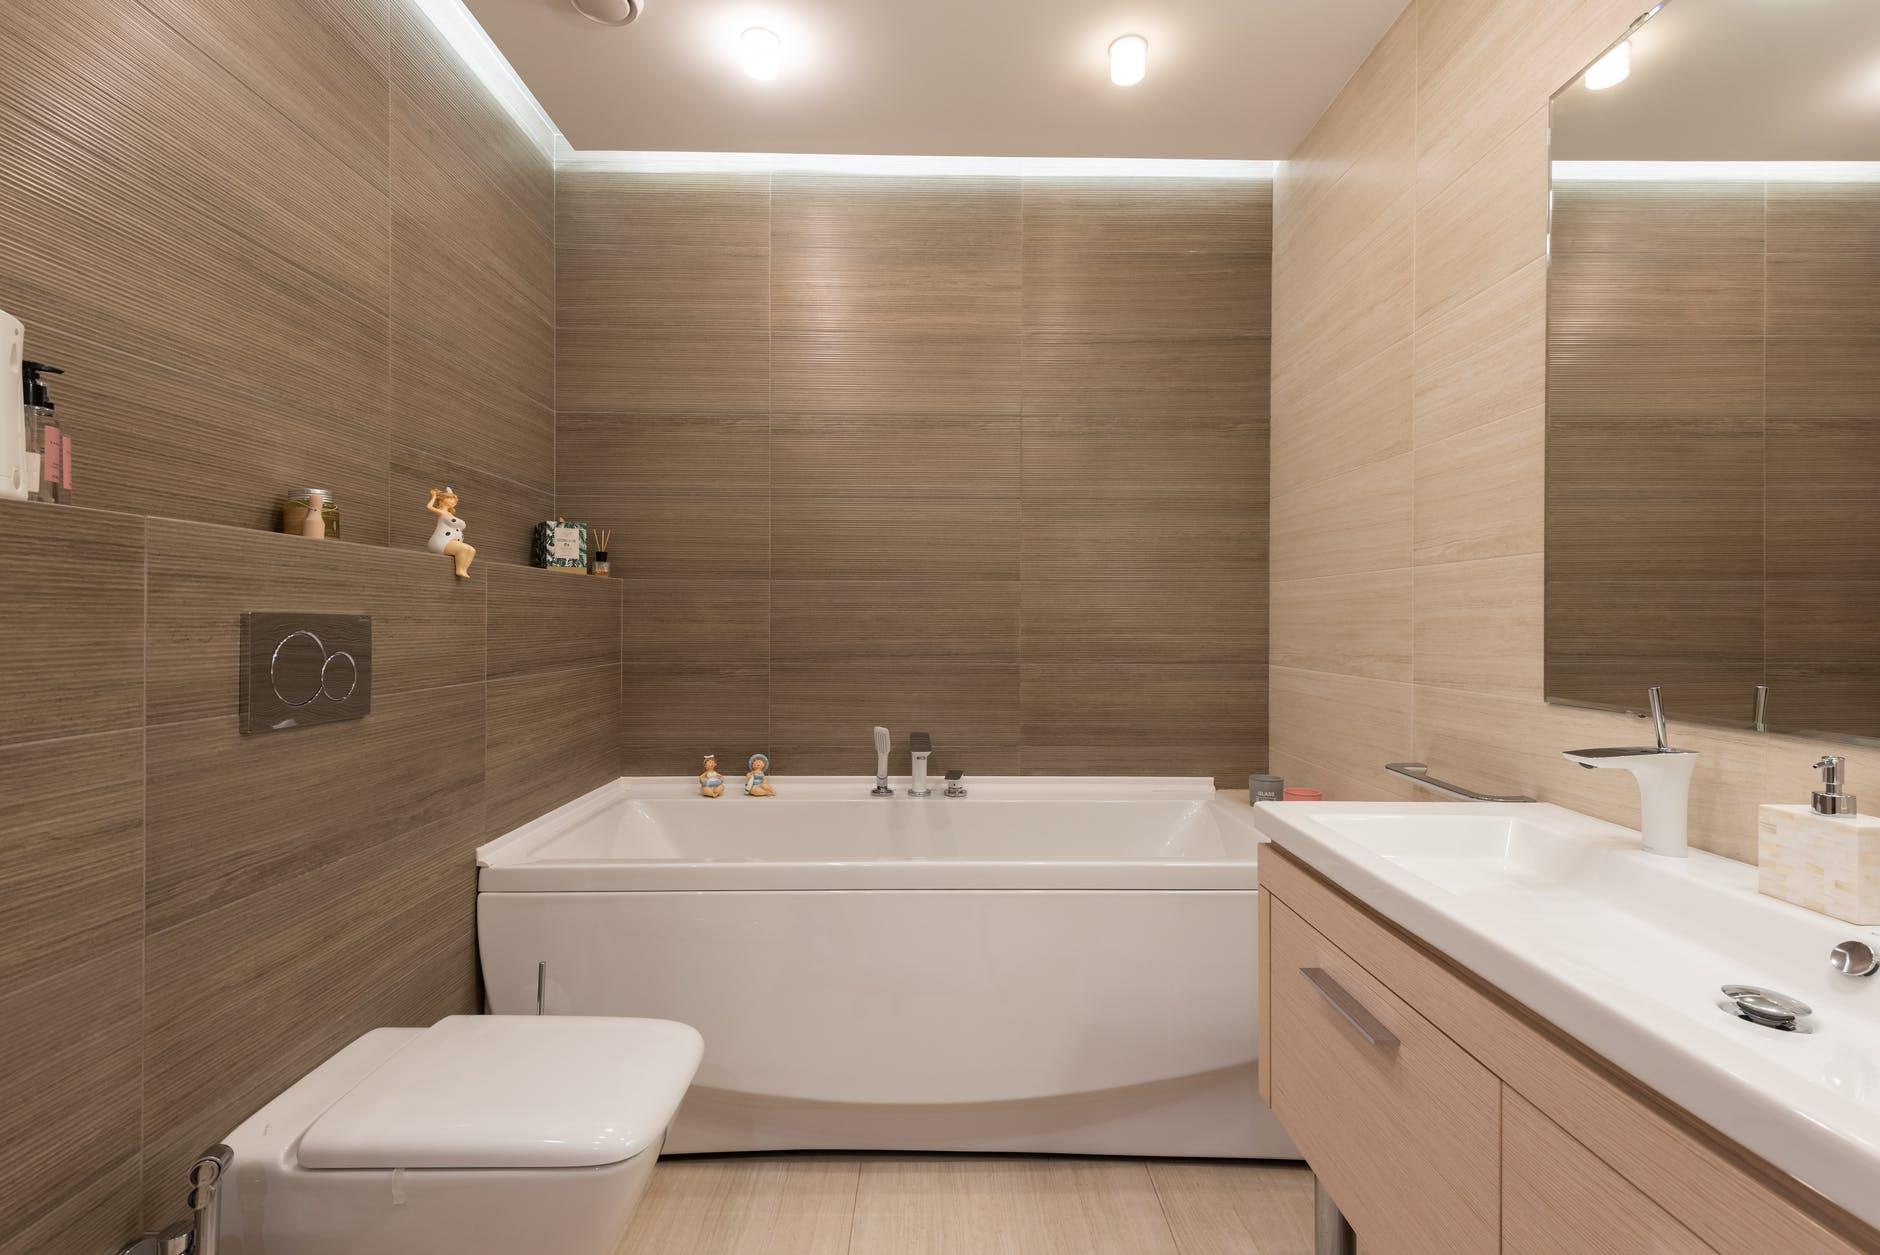 Wood-mimicking tiles in bathroom